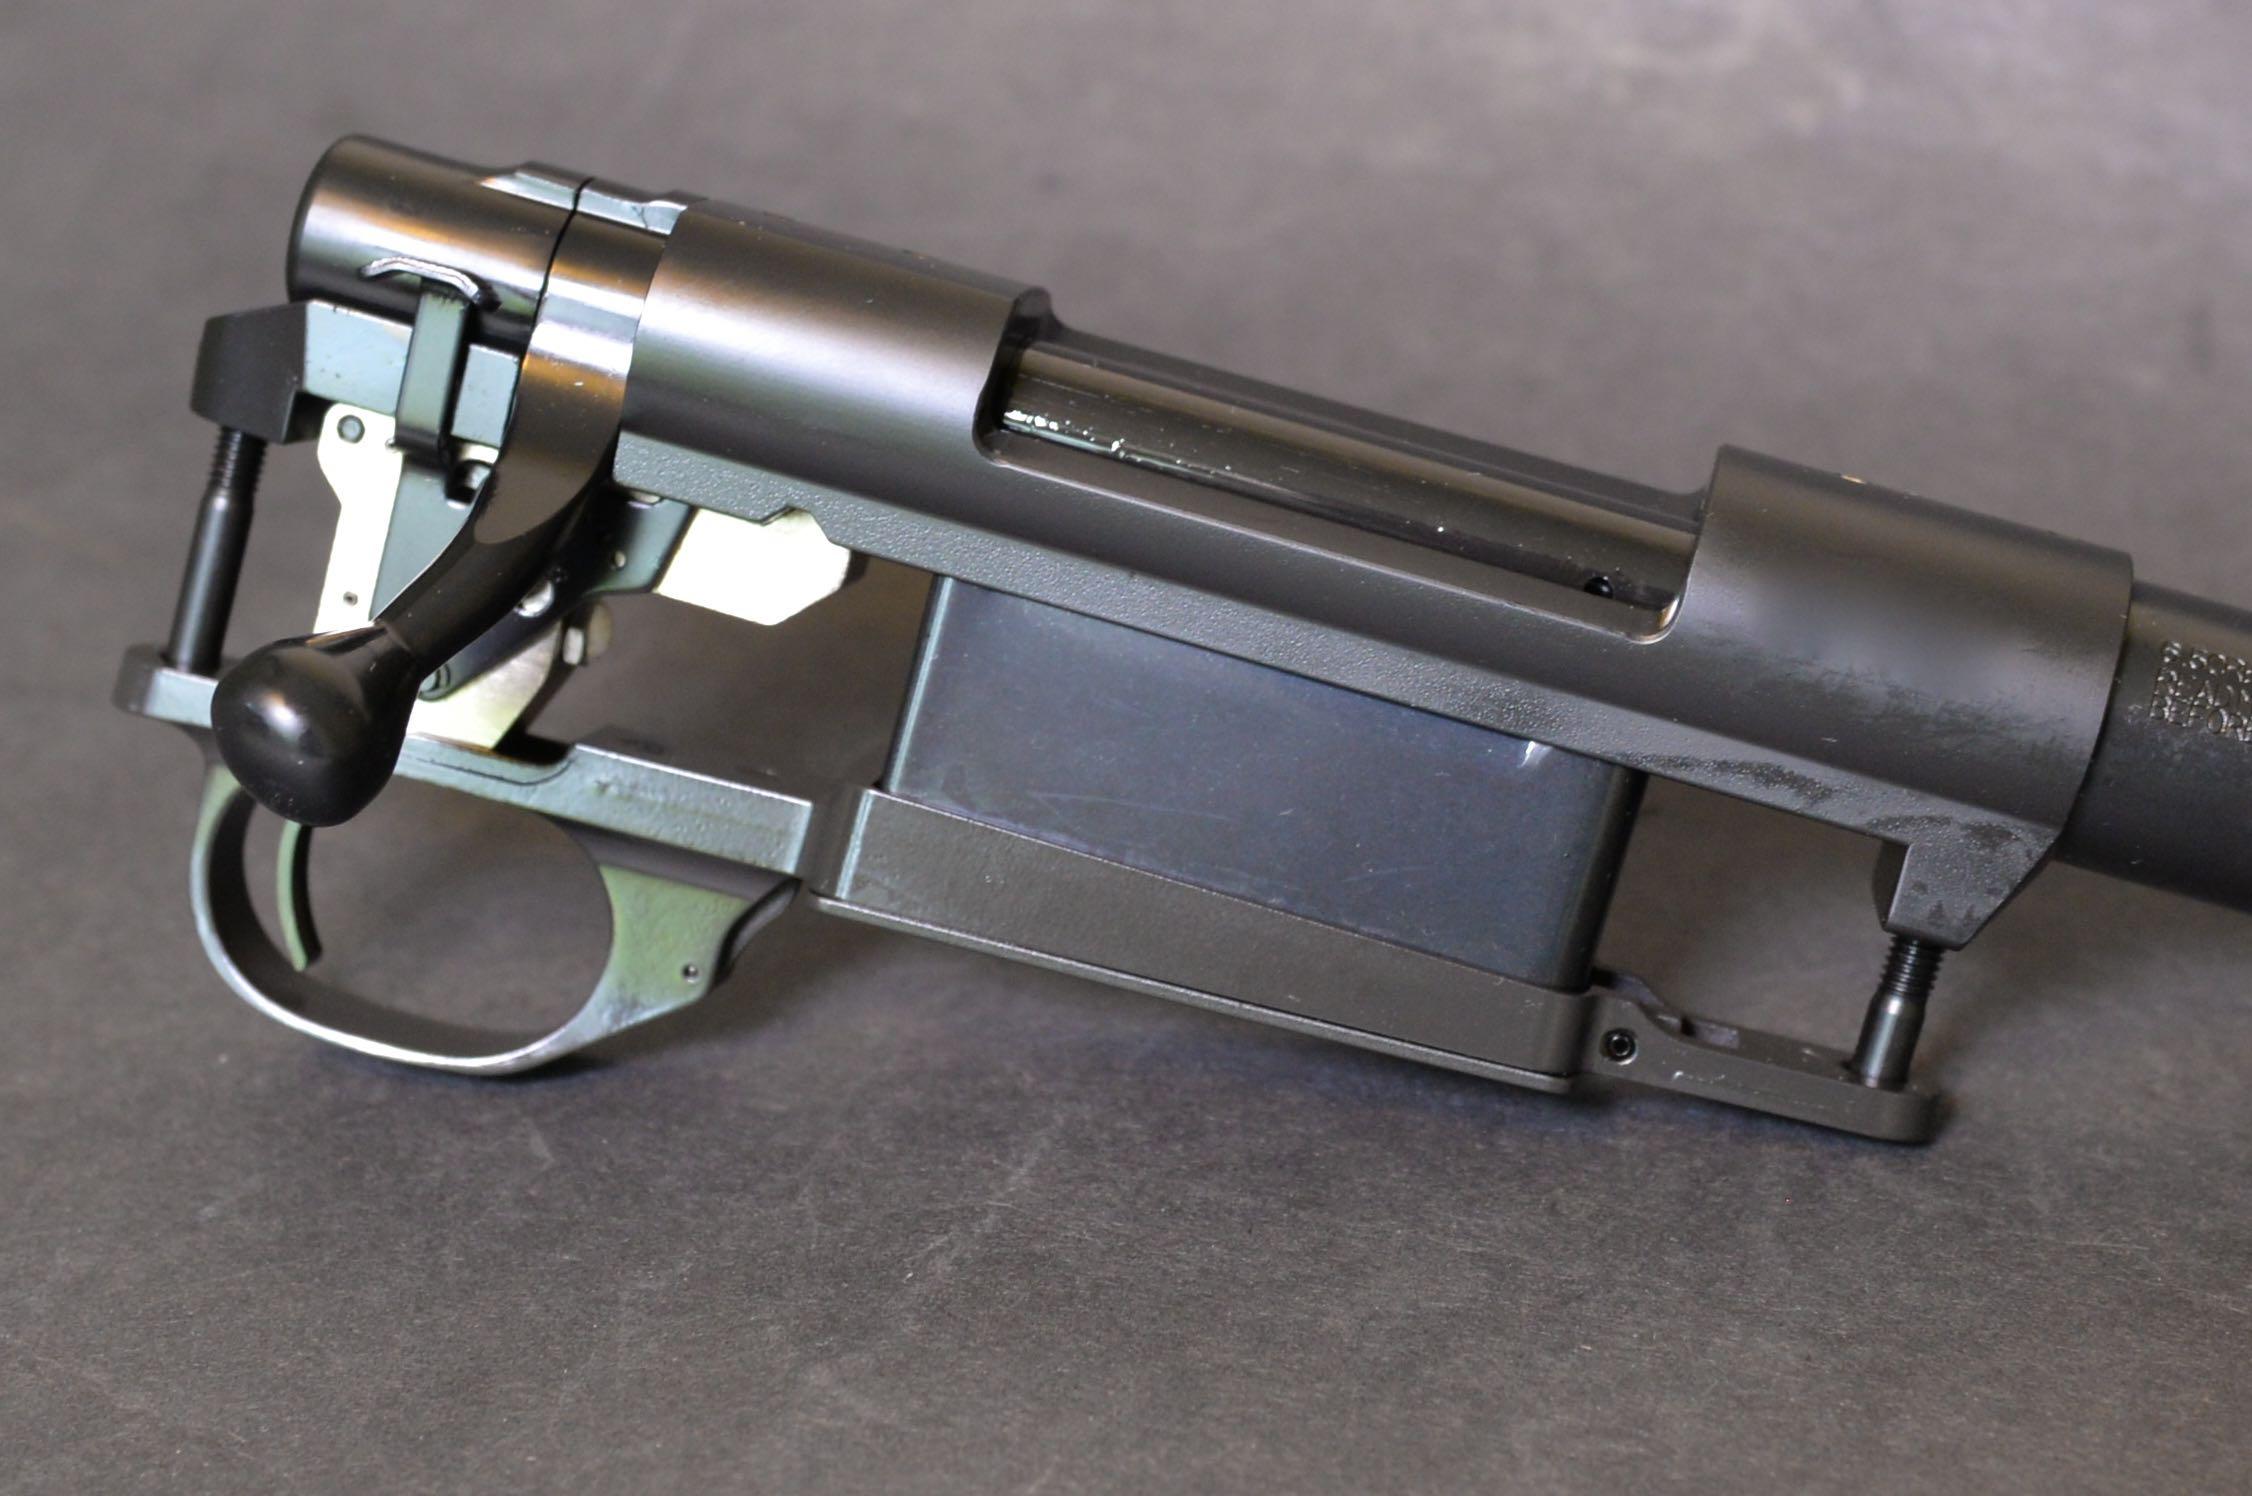 Howa 1500 barreled action review: Howa 1500 versus Remington